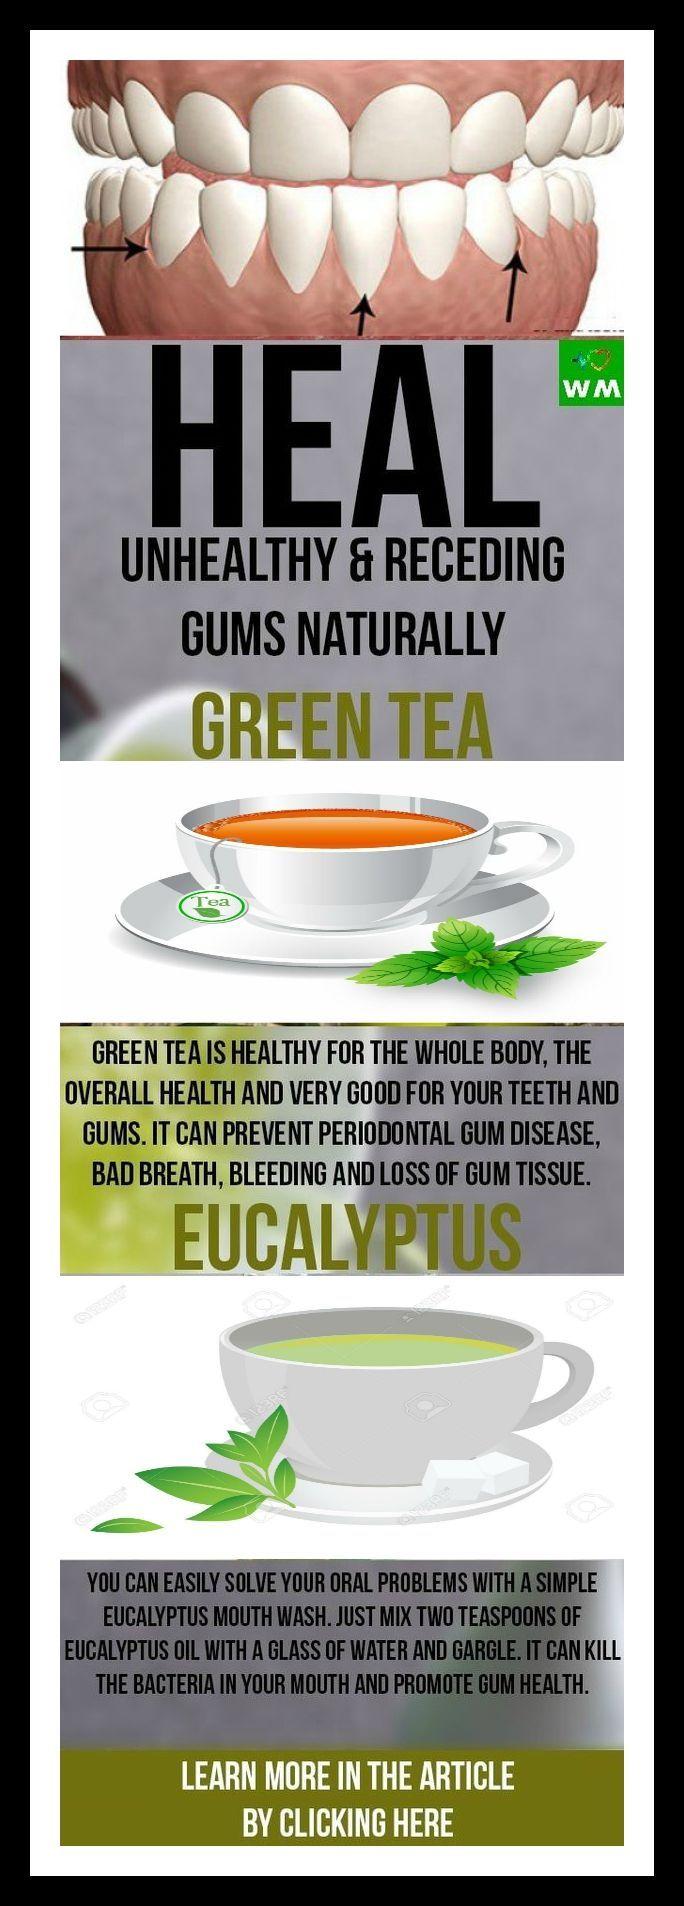 Heal Unhealthy & Receding Gums Naturally #health #fitness #recedinggreentea #homeremedies #gumhealth...